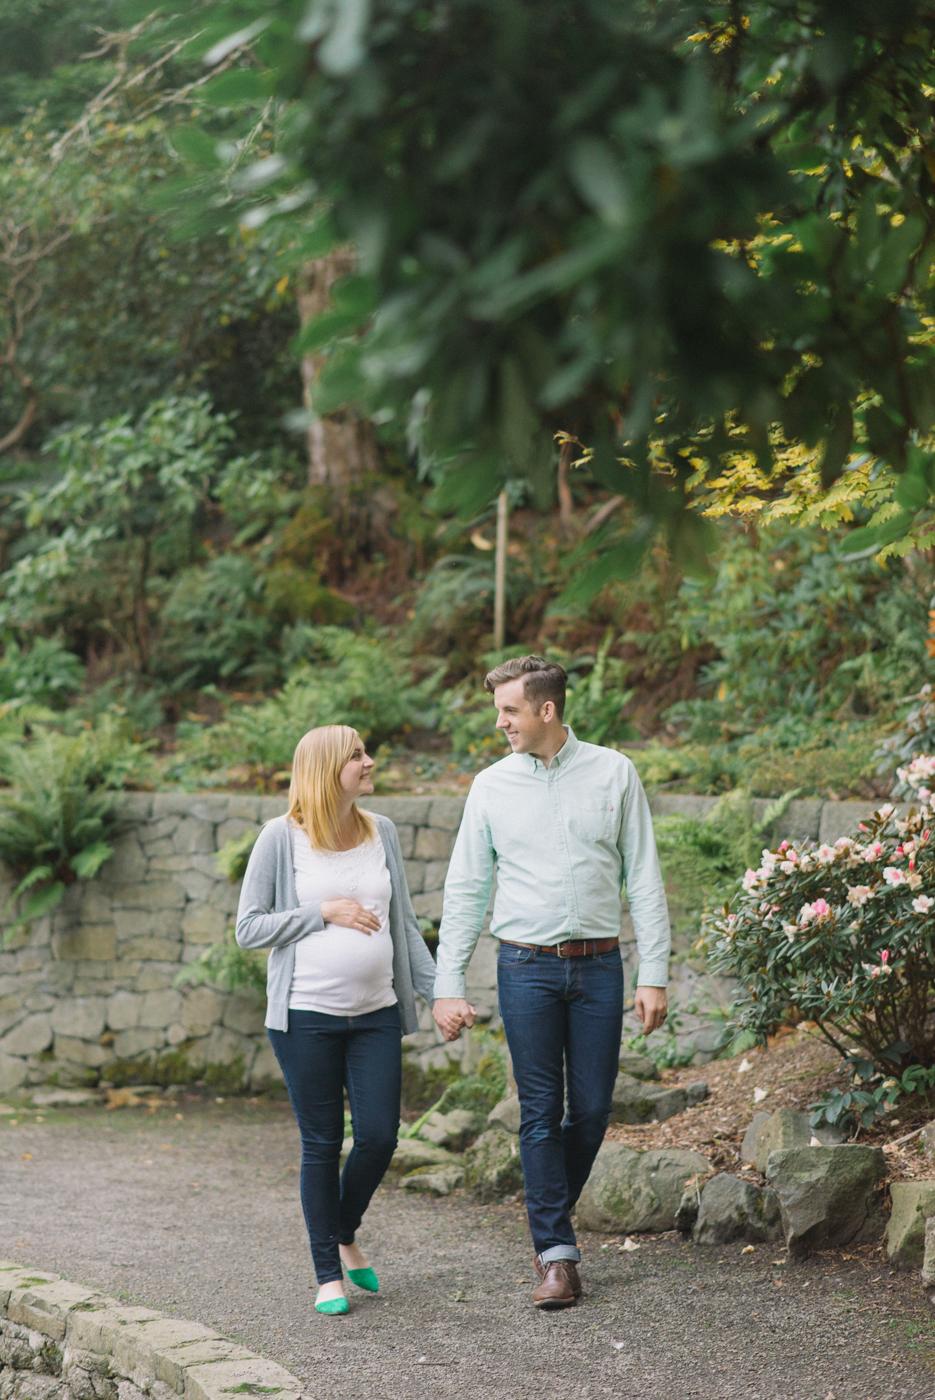 portland-oregon-maternity-photography-pregnancy-crystal-springs-rhododendron-garden-walking-sweet-romantic-shelley-marie-photo-1